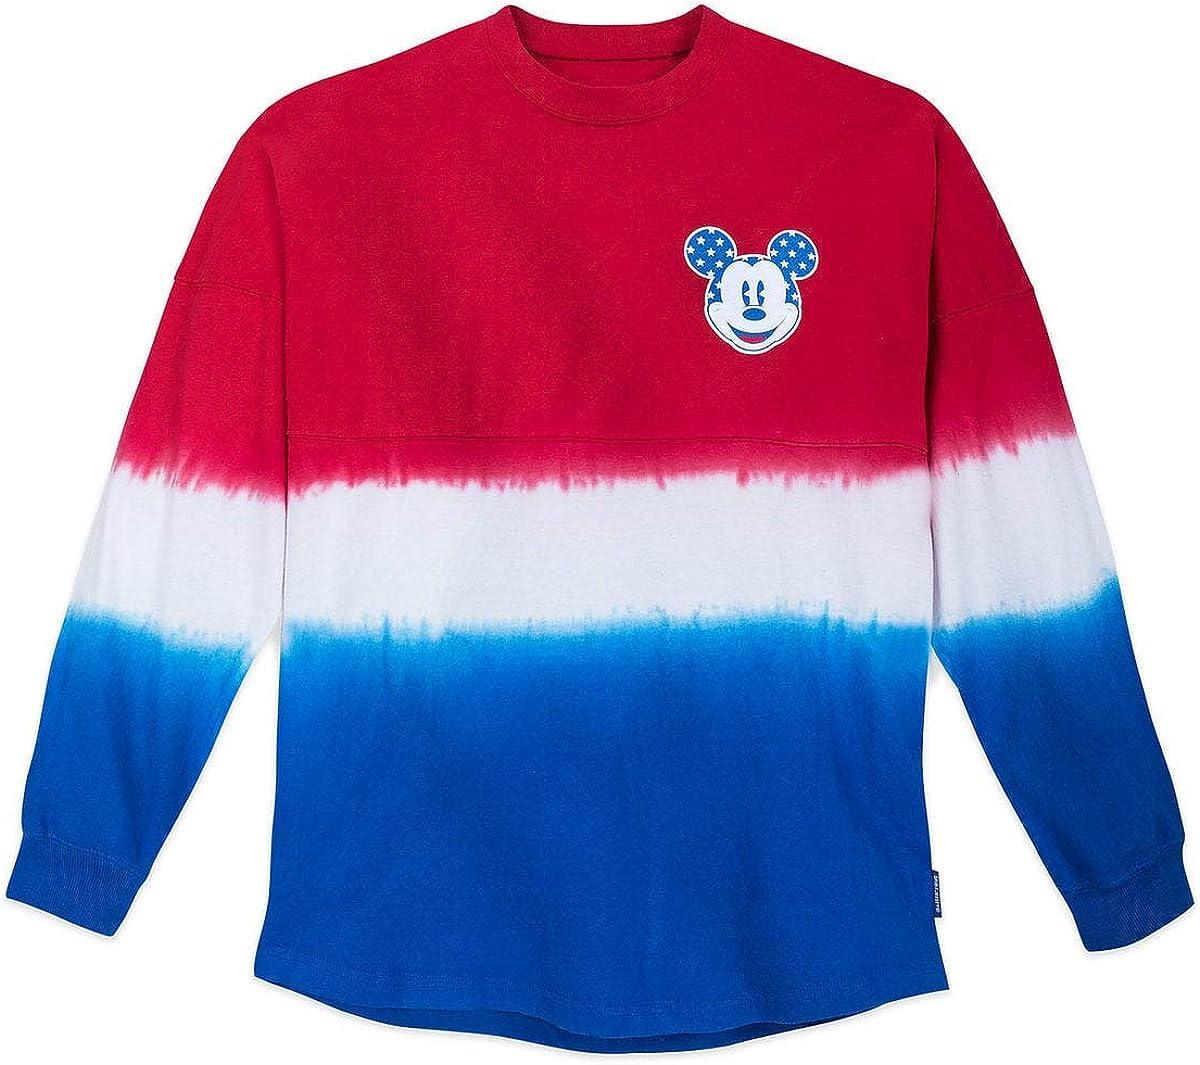 Disney Mickey Mouse Tie-Dye Americana Spirit Jersey for Adults Multi